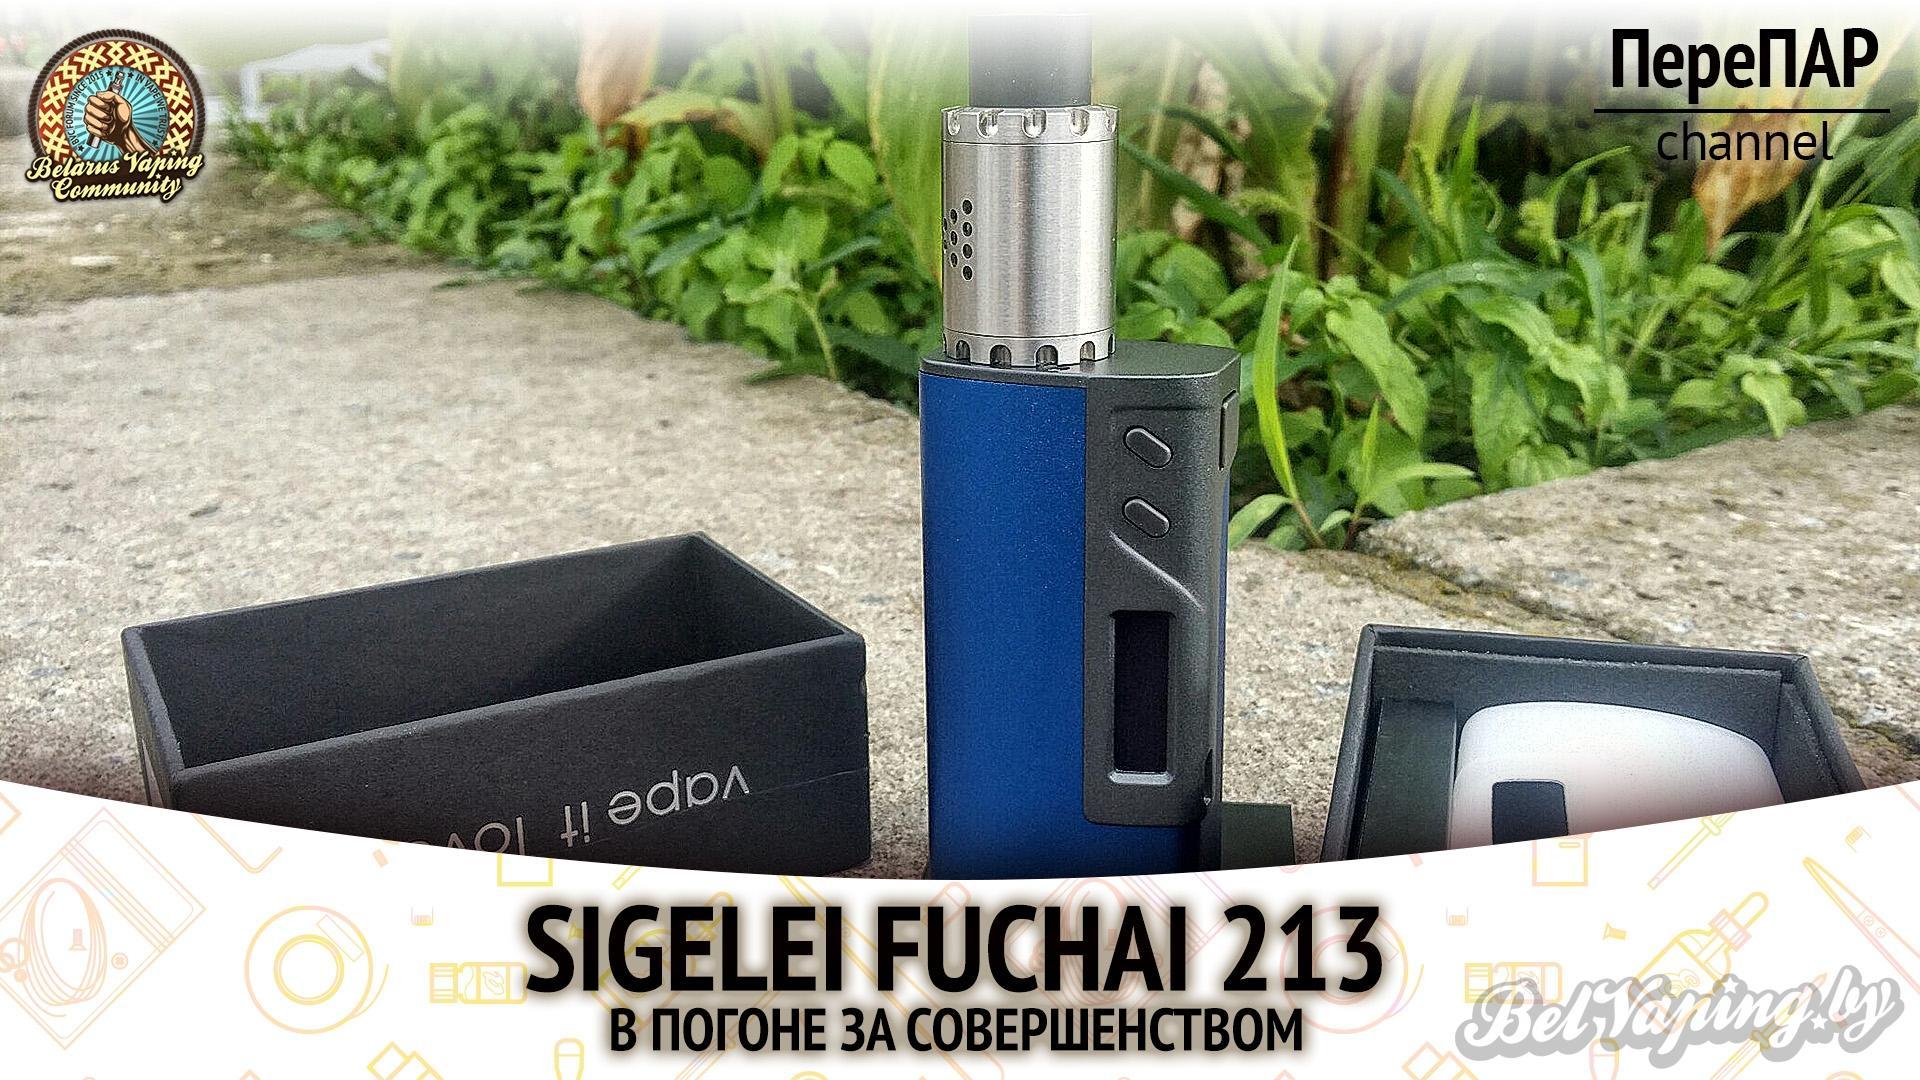 Обзор Sigelei Fuchai 213